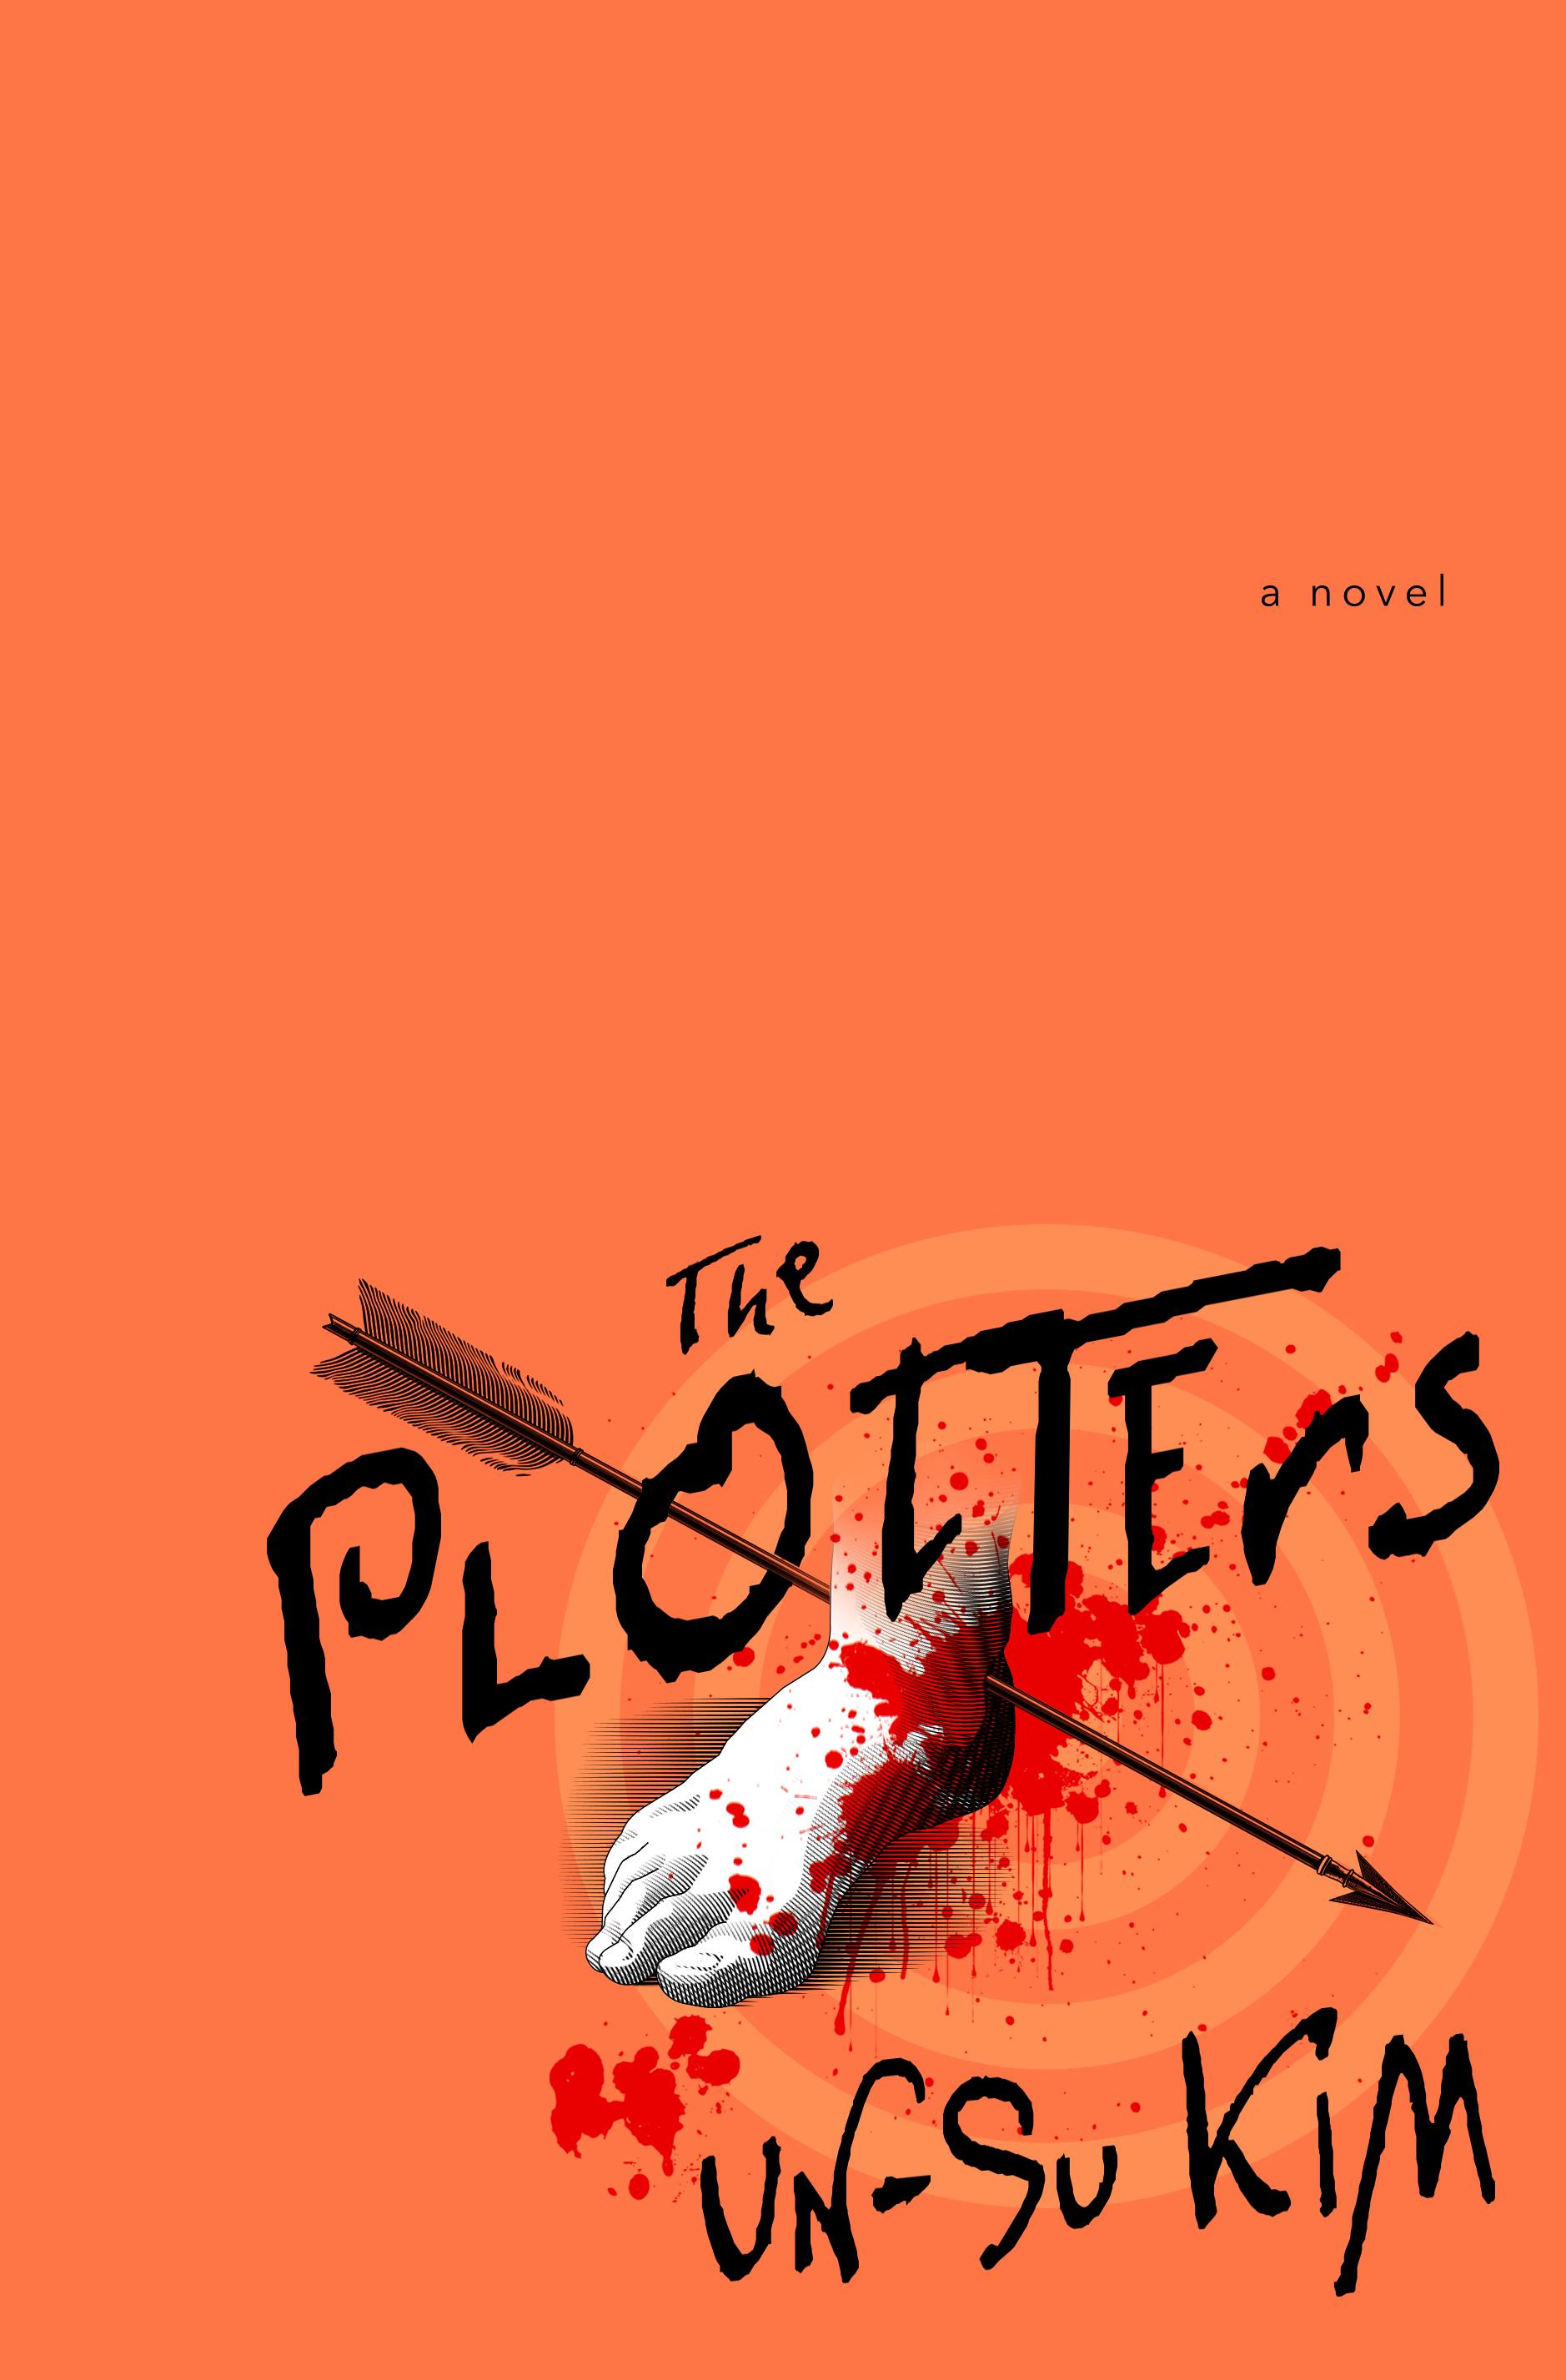 plotters art 1.jpg